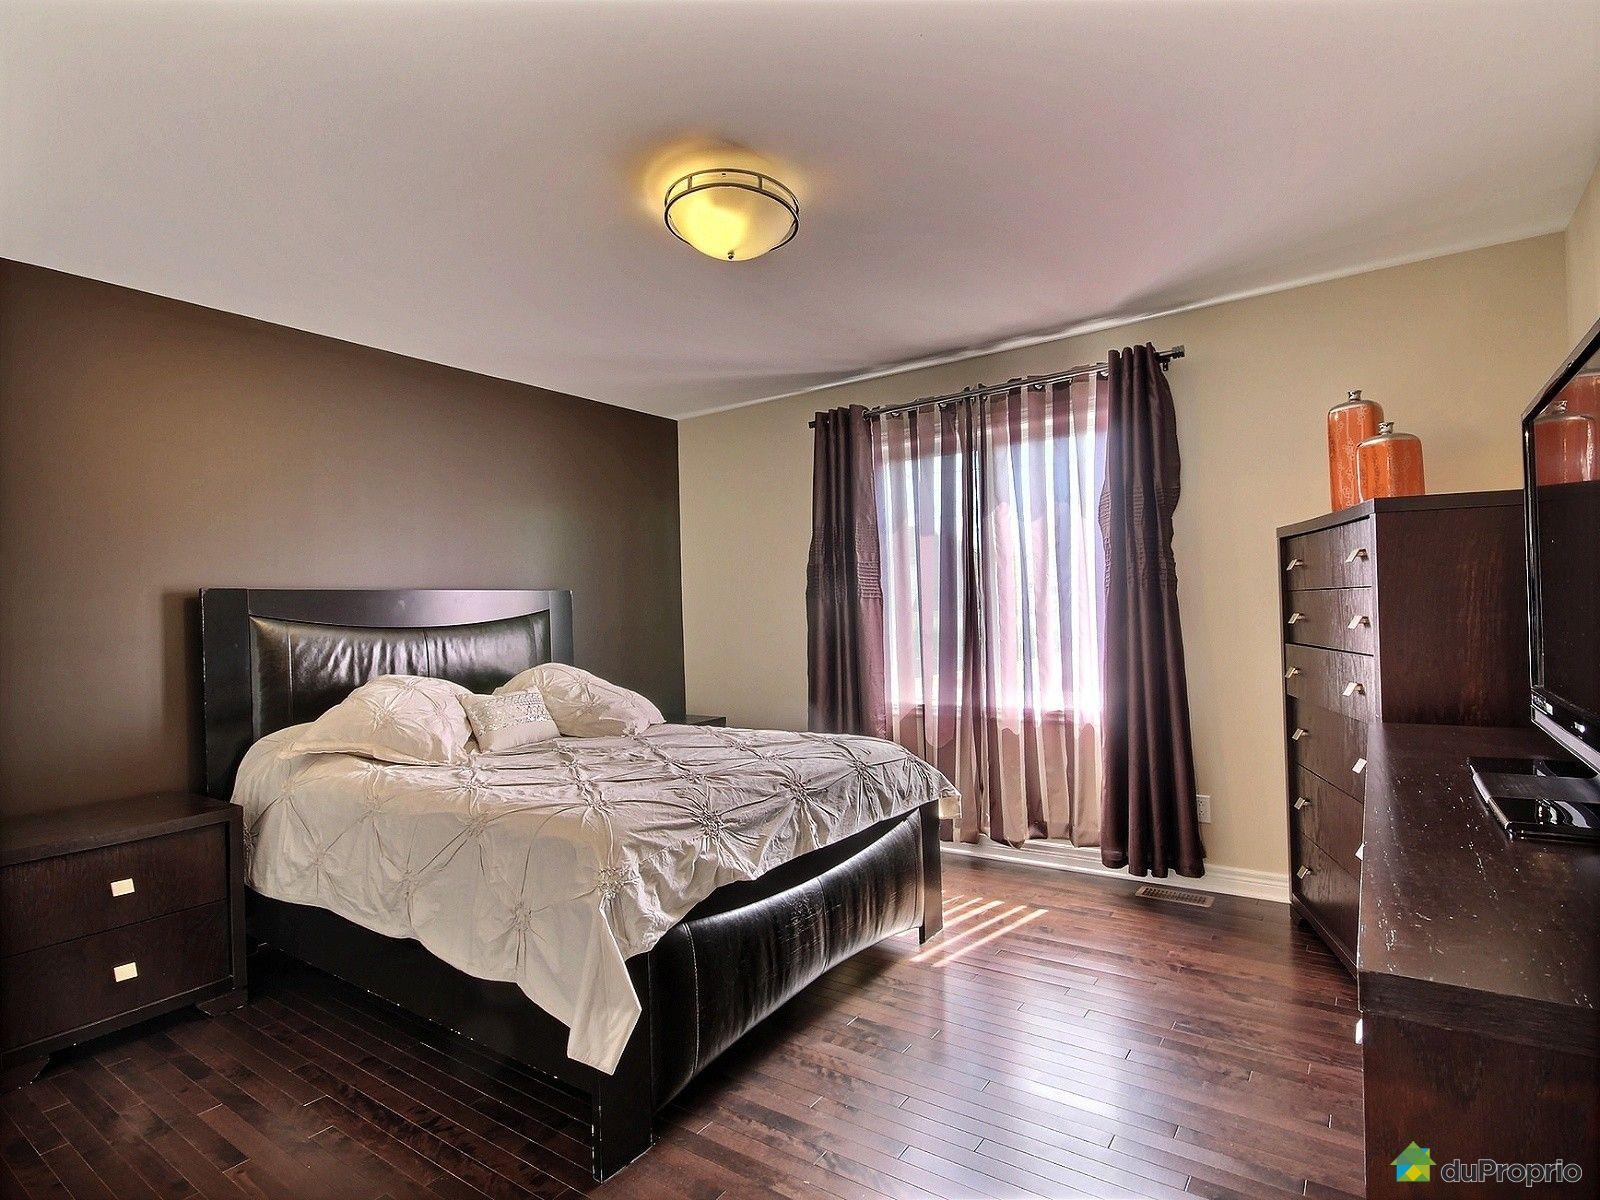 Maison vendre mirabel 17995 rue roger lemelin for Chambre de commerce mirabel